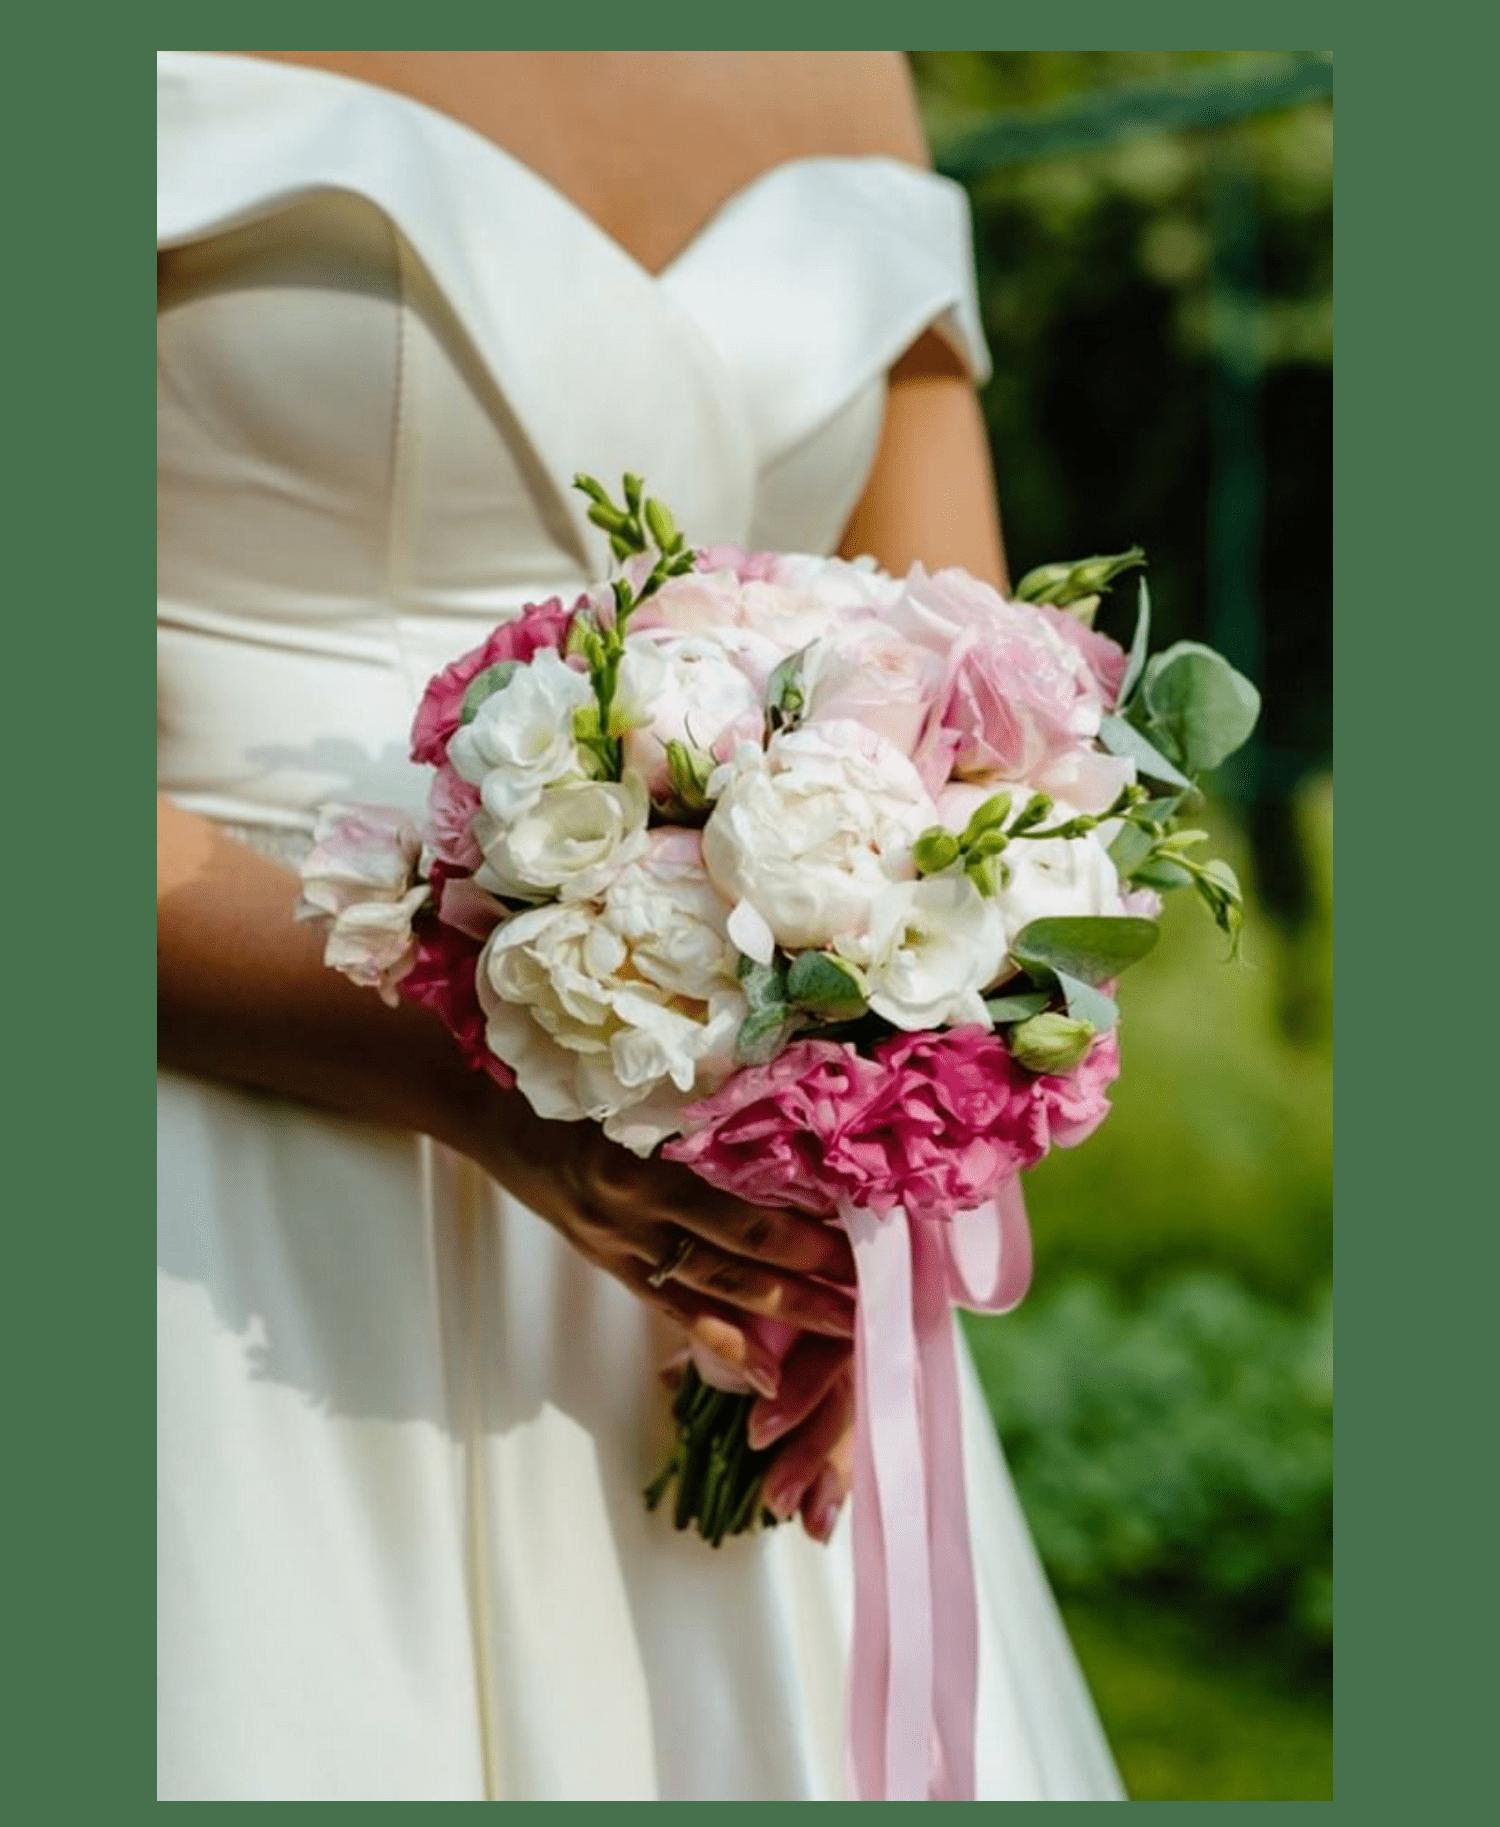 Букет невесты 1 – Інтернет-магазин квітів STUDIO Flores